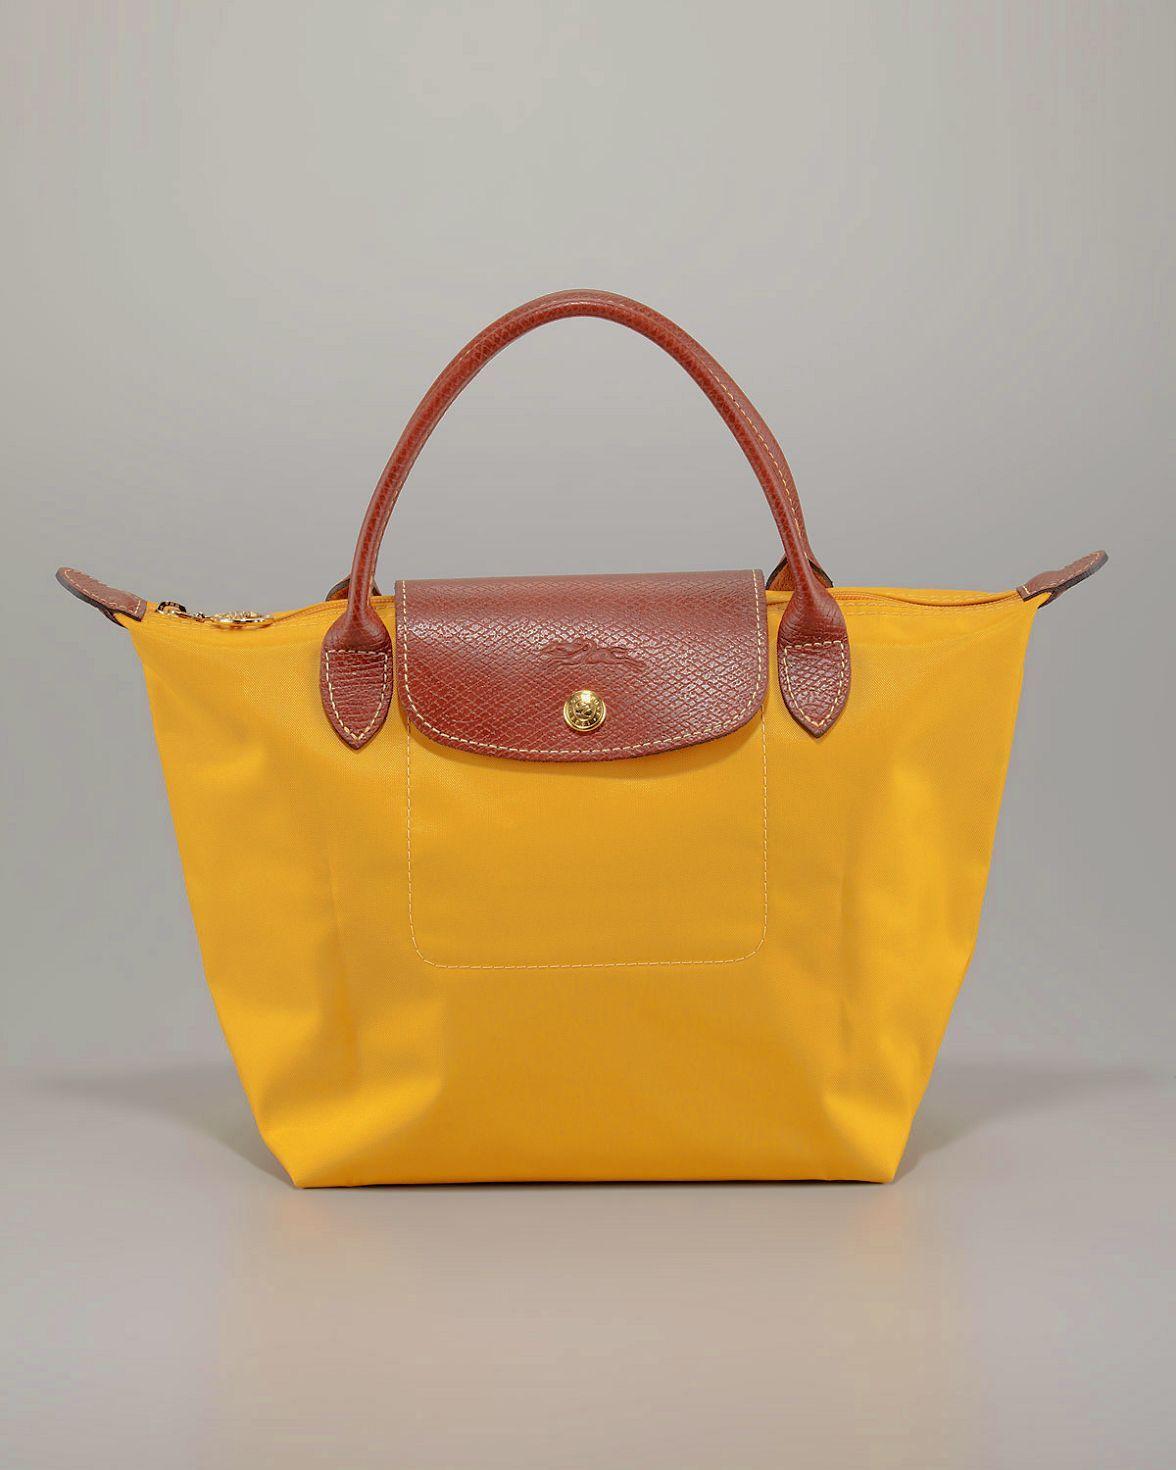 8f77b08aa62 Longchamp Le Pliage Leather Cuir Small Shoulder Bag | Women's street ...